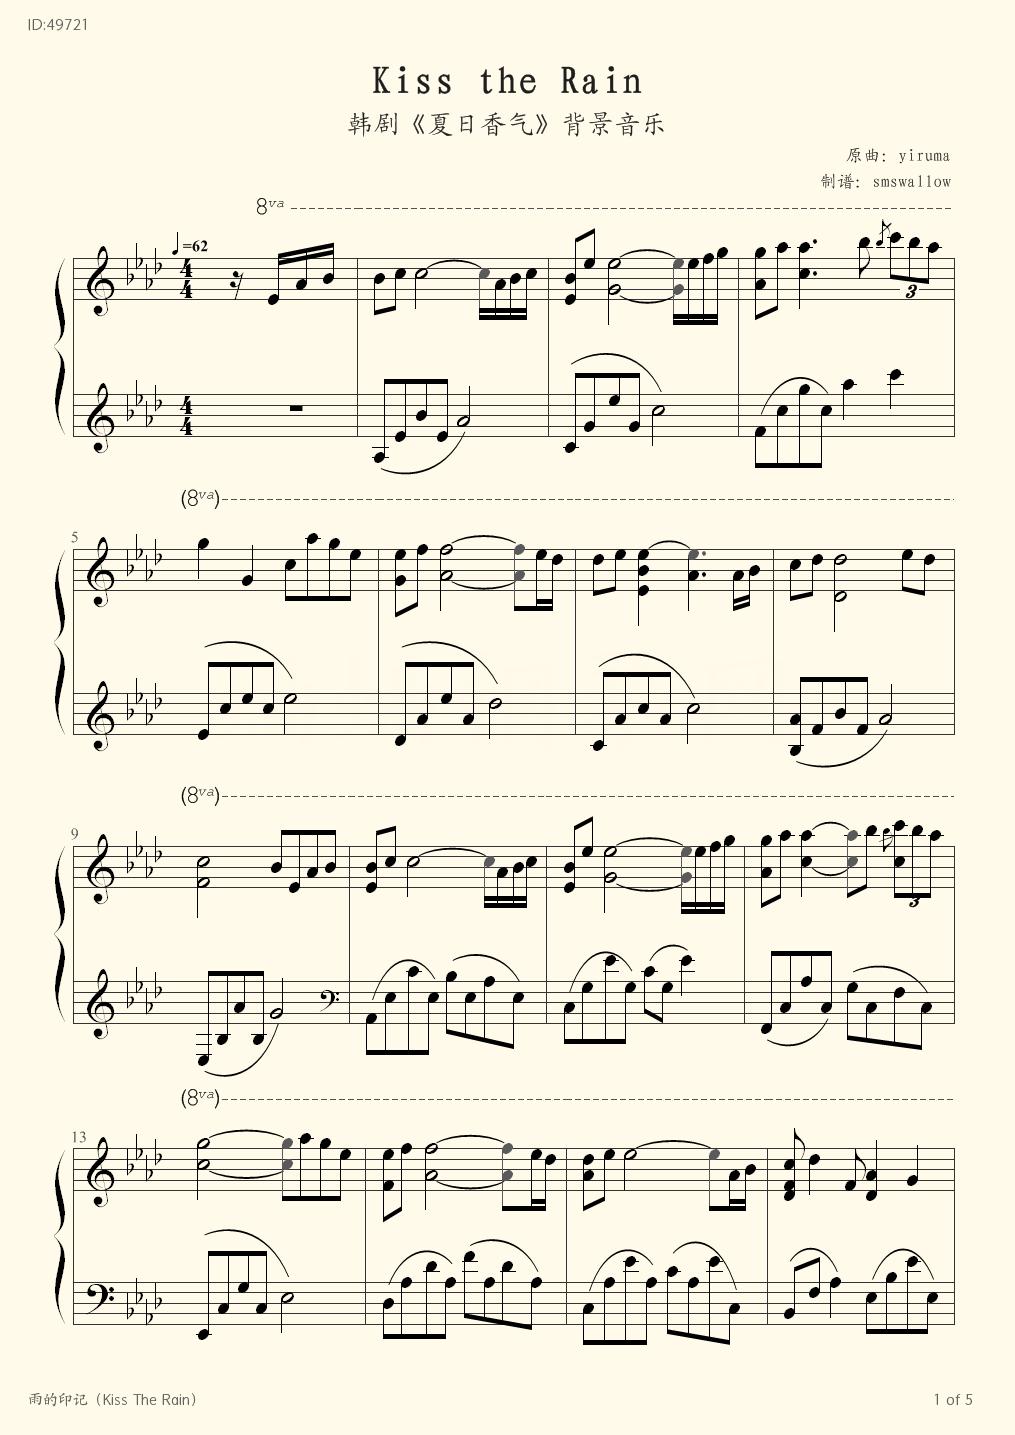 Kiss The Rain - yiruma - first page